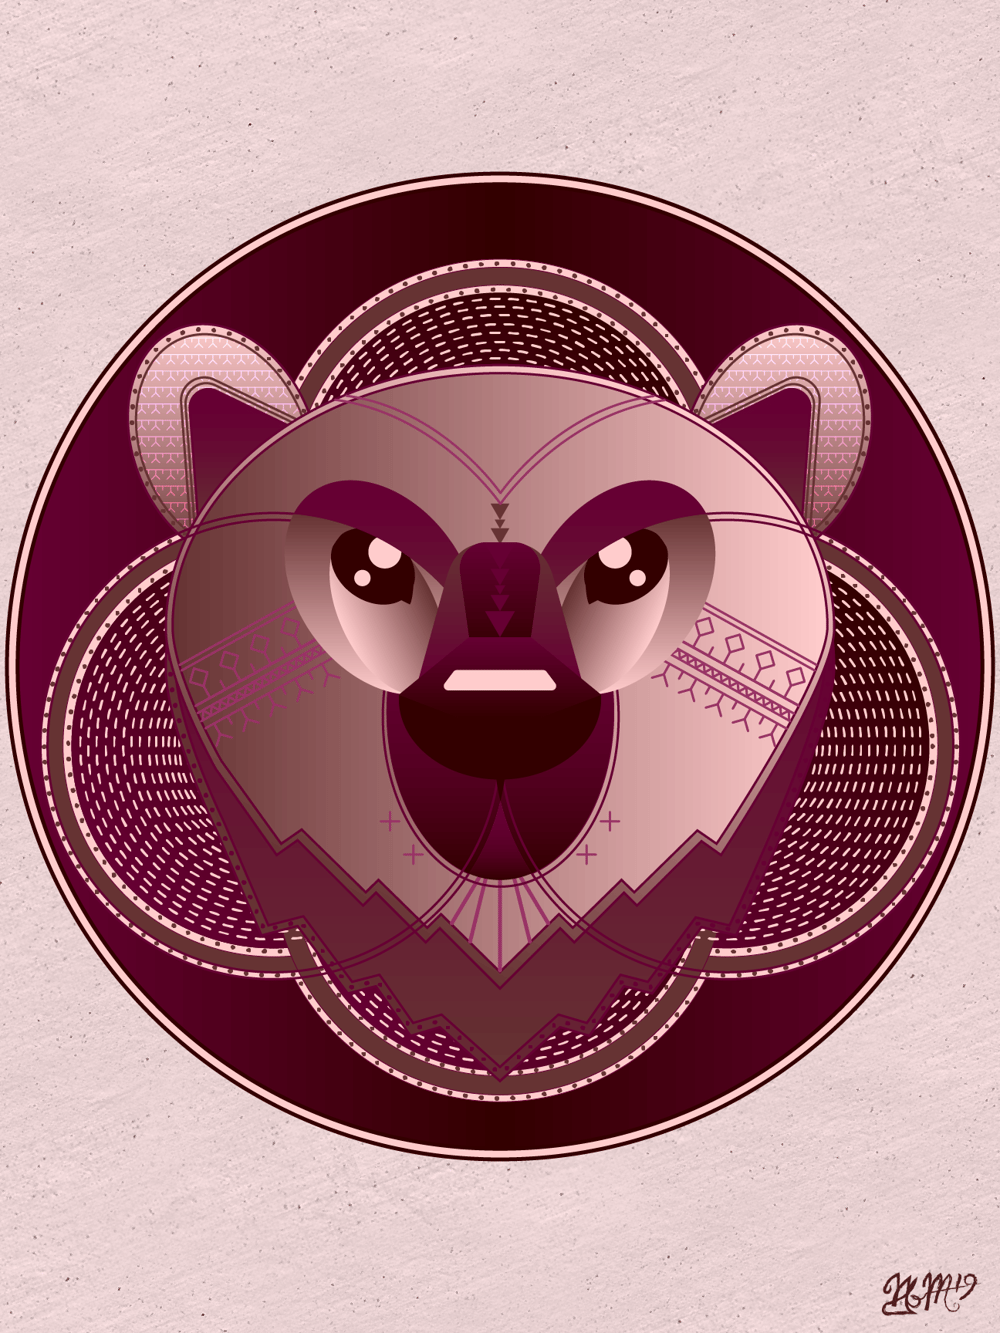 Polar Bear - image 5 - student project